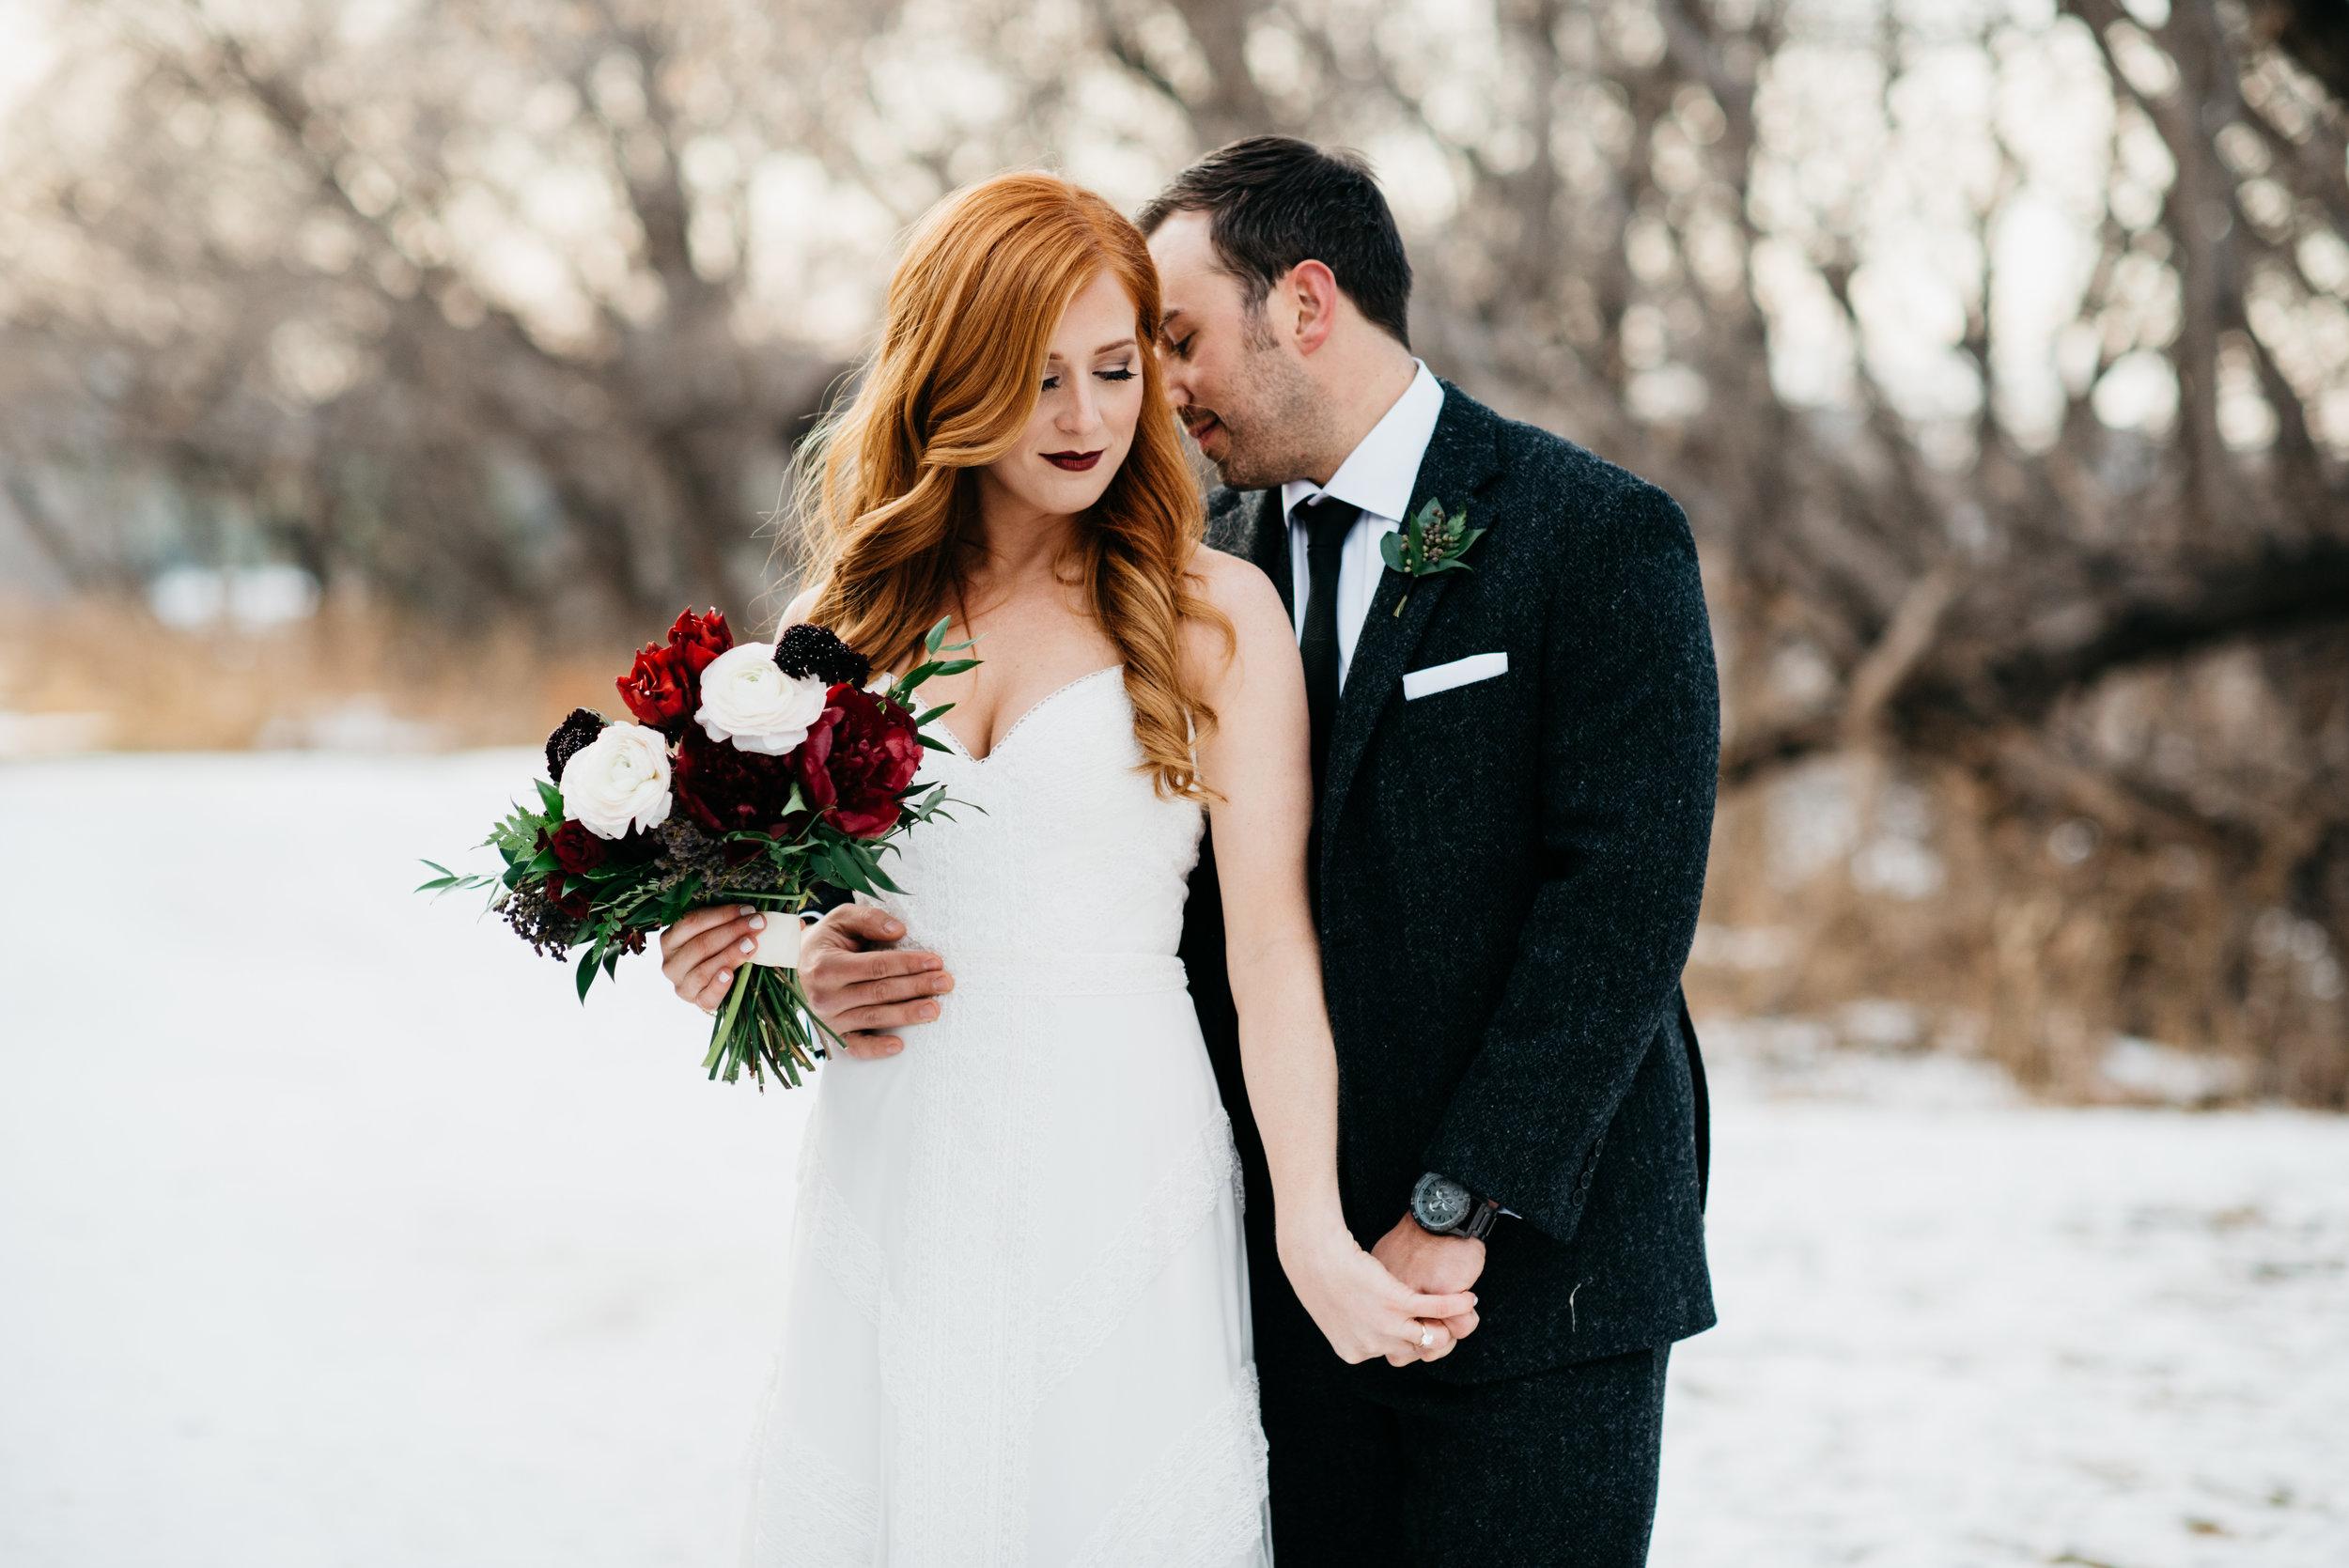 Winter Wedding in Winnipeg - Stone House Creative